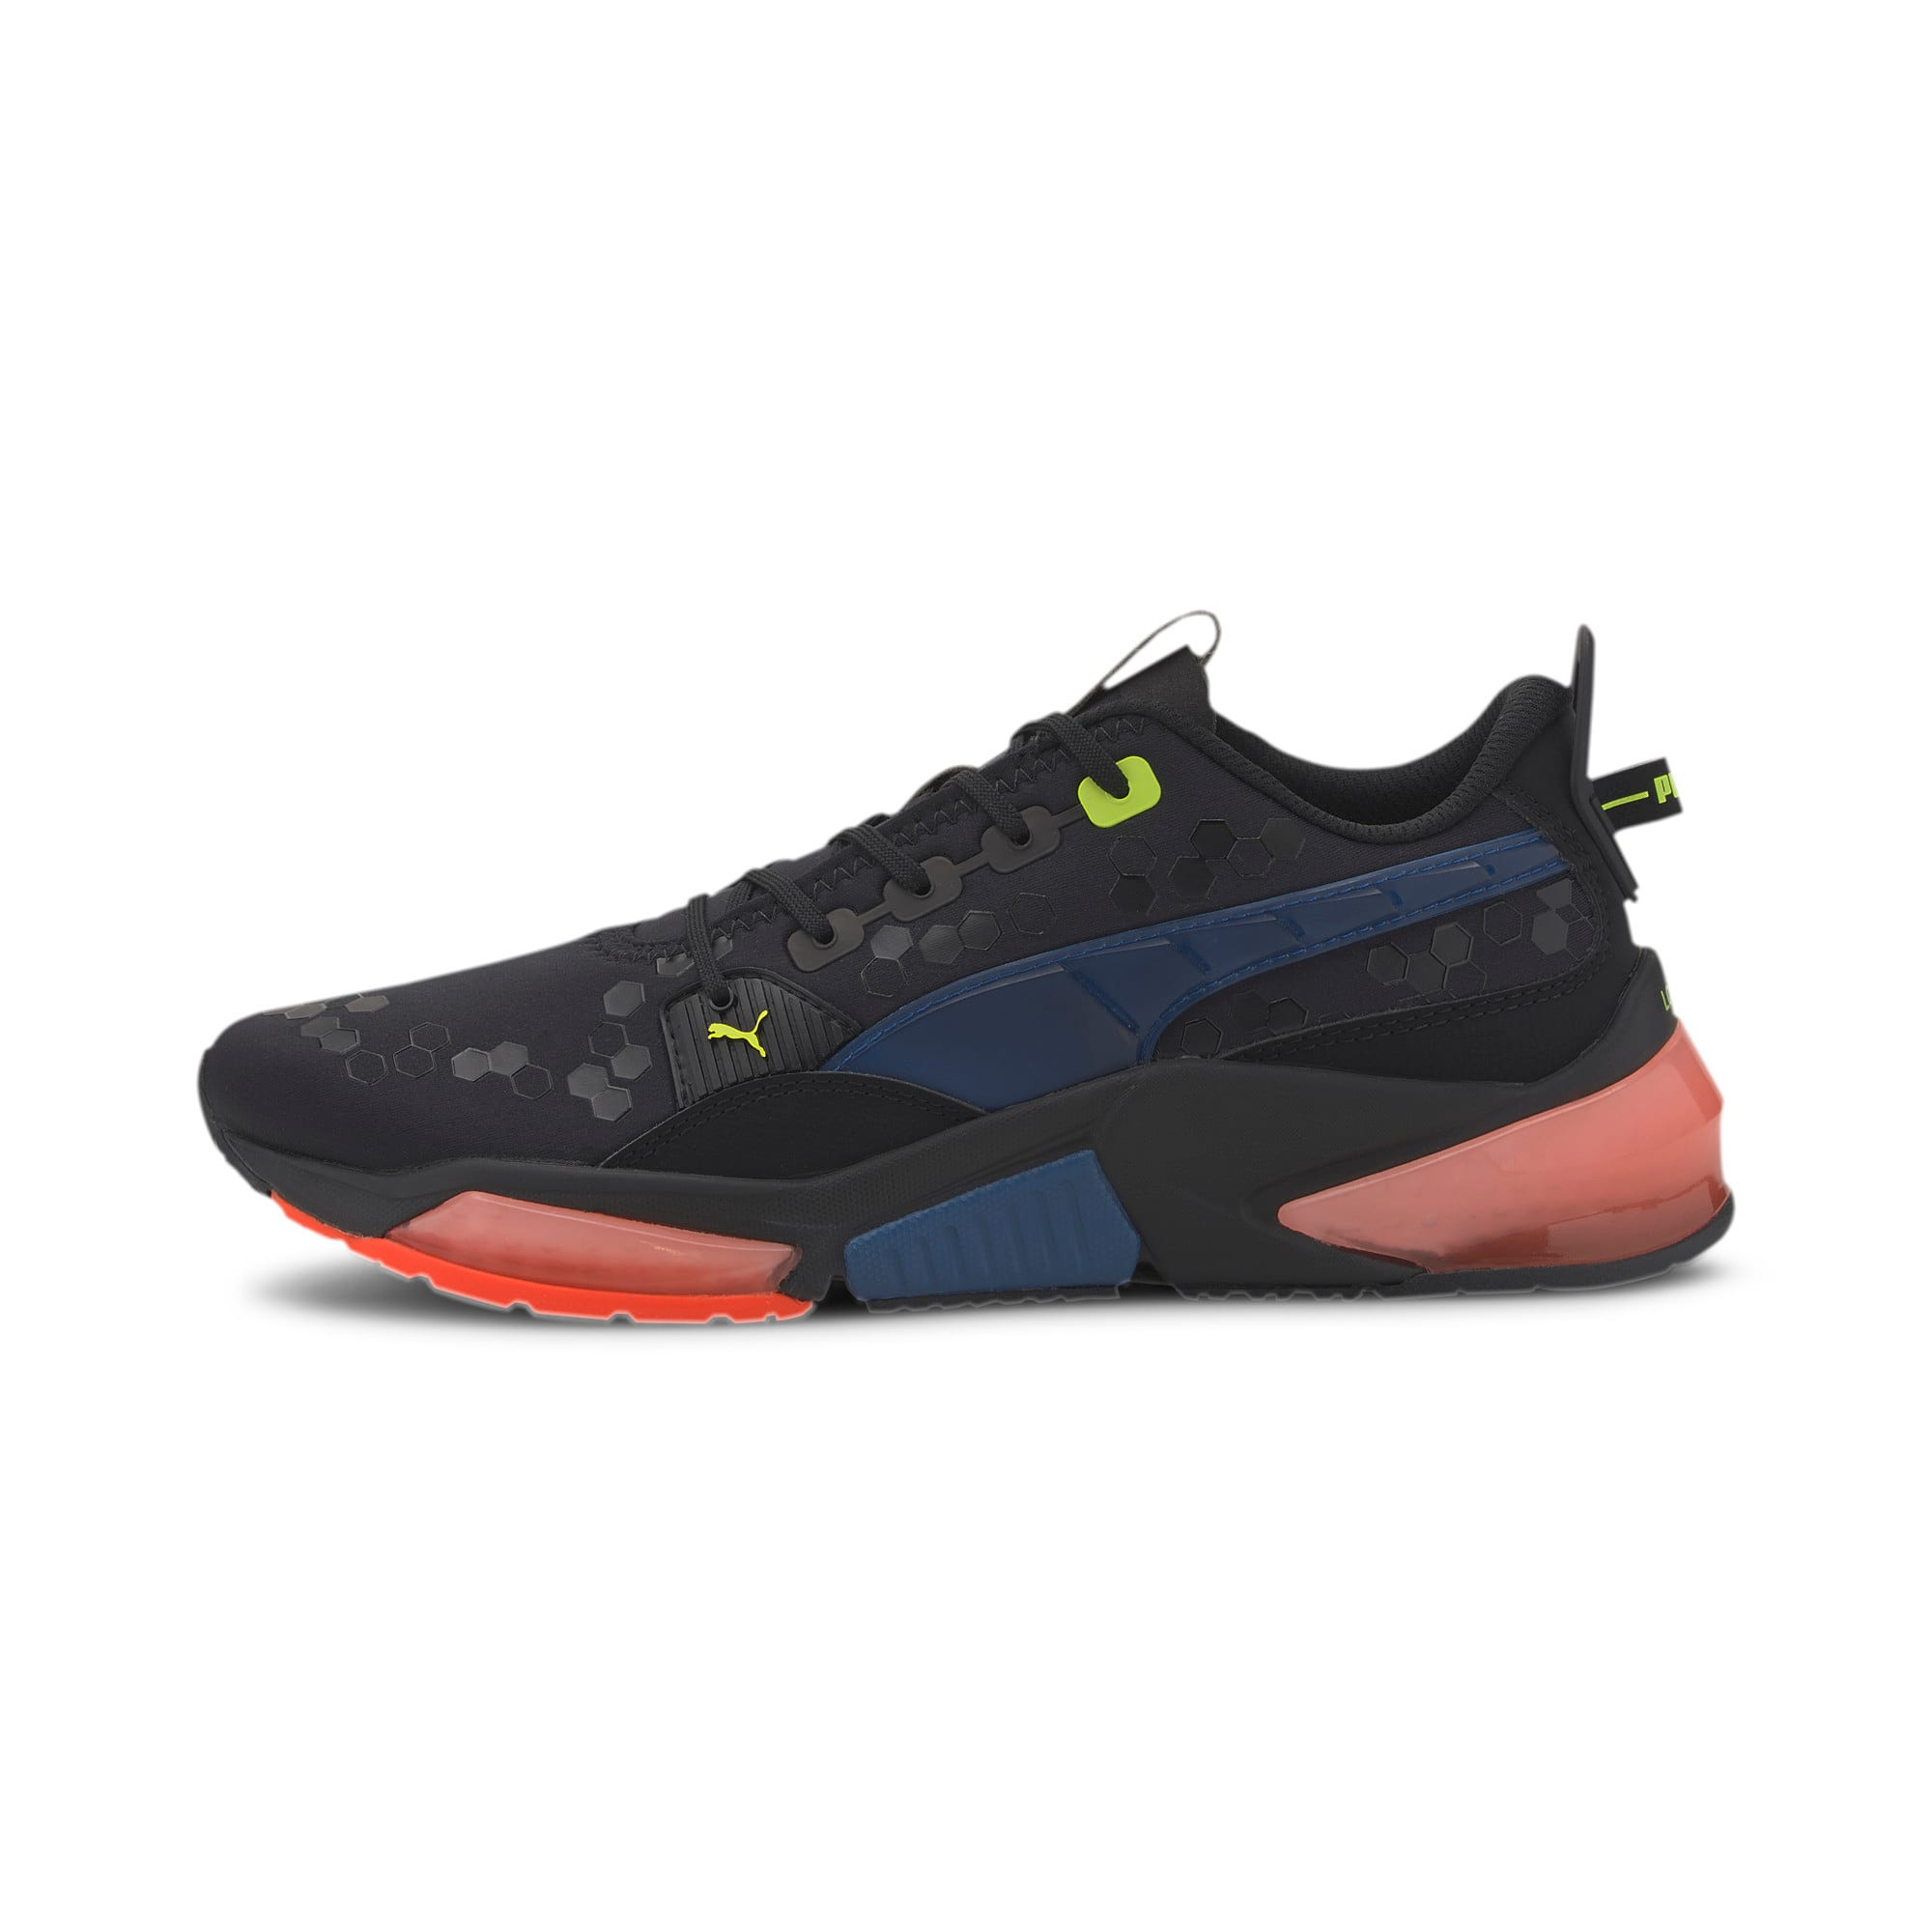 Thumbnail 1 of LQDCELL Optic Men's Training Shoes, Puma Black, medium